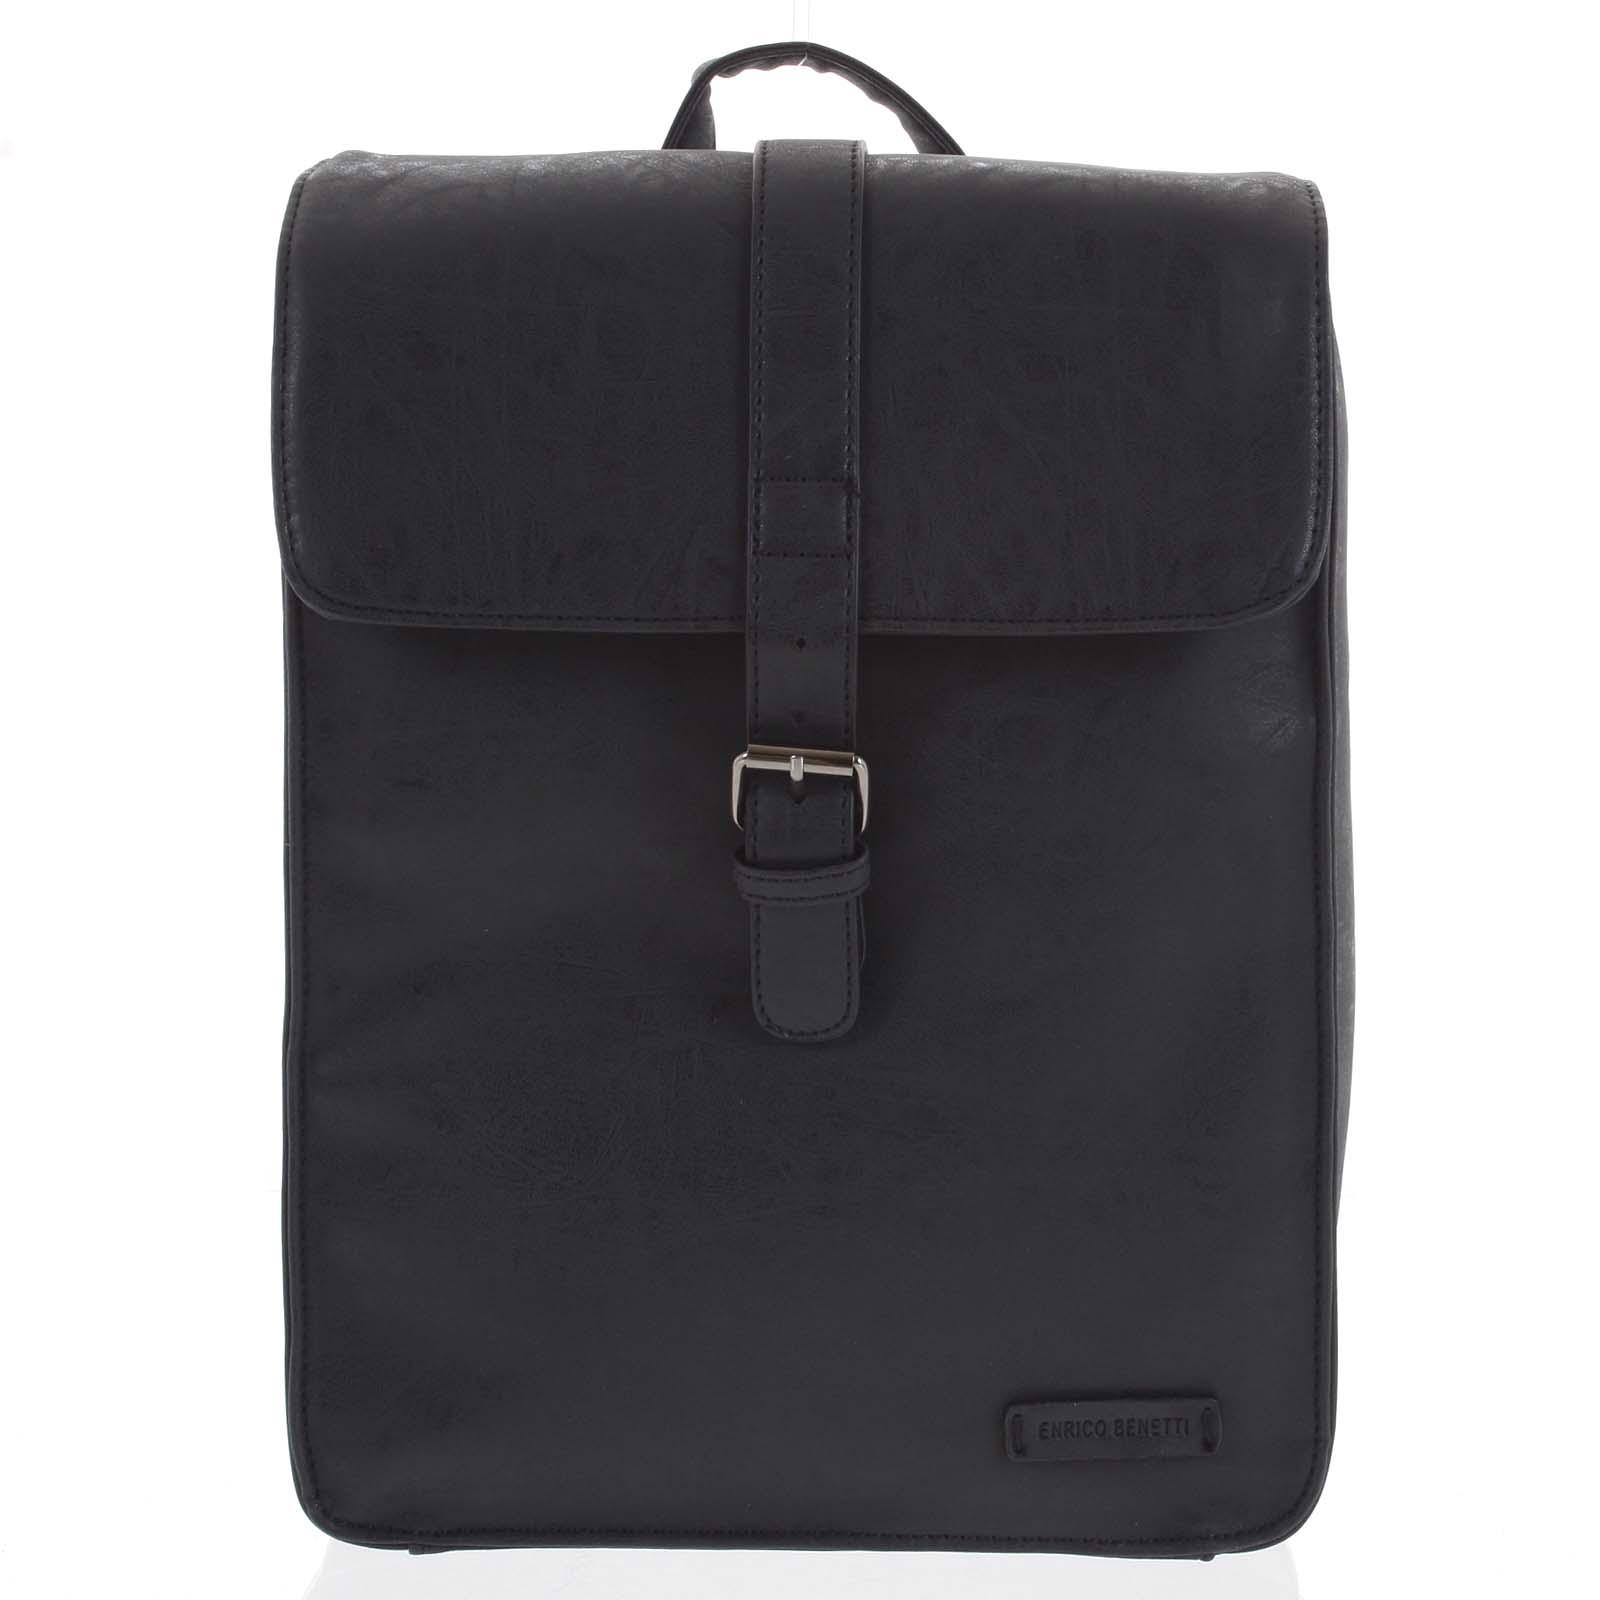 Stylový batoh černý - Enrico Benetti Steffani